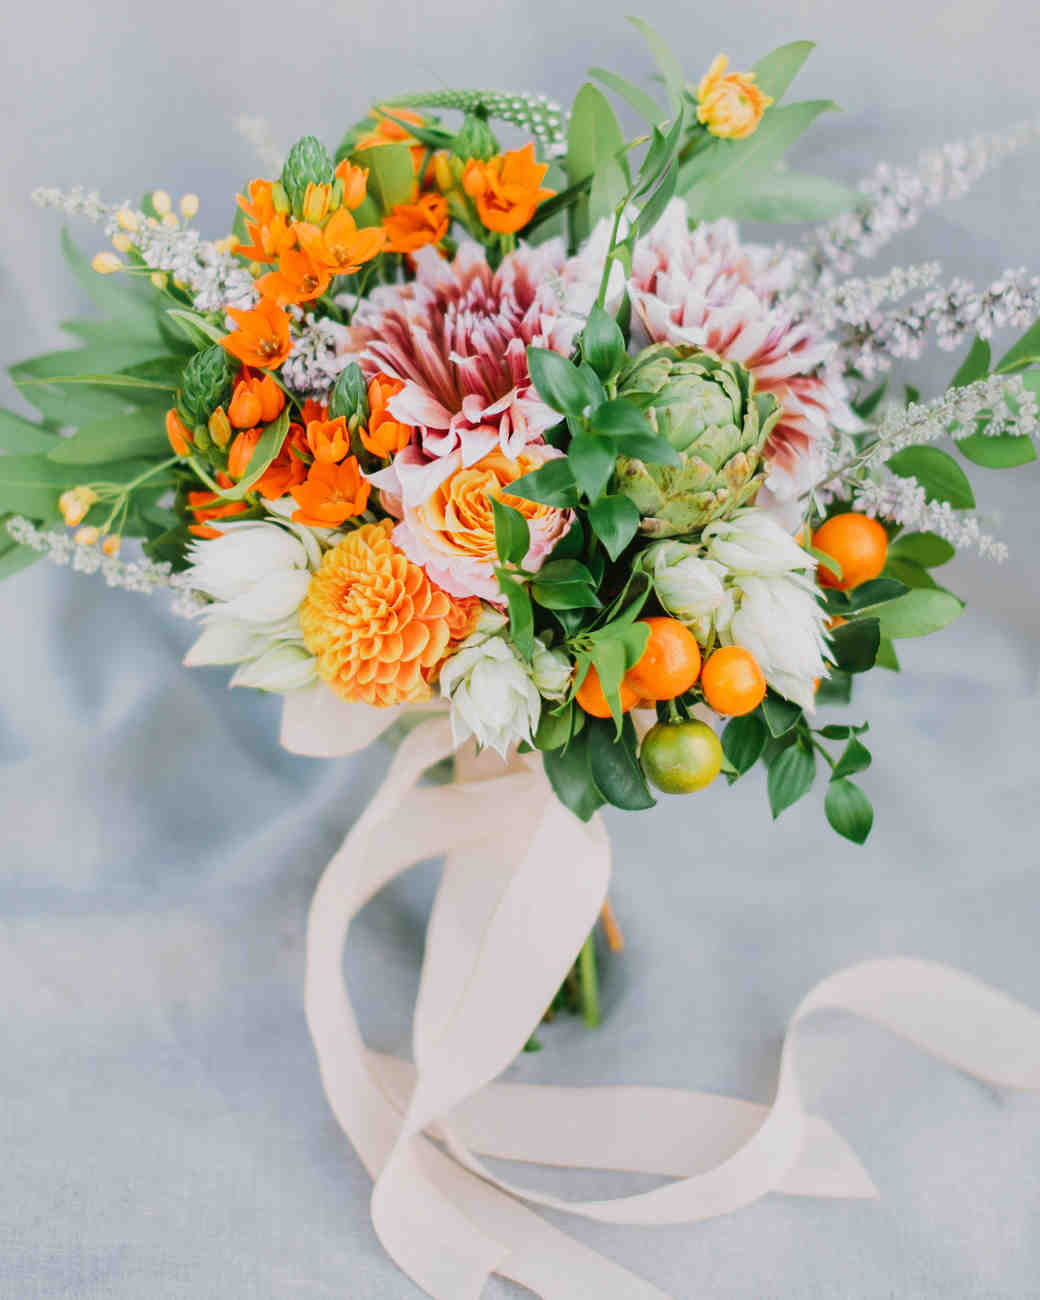 bouquet wraps bright flowers white ribbon